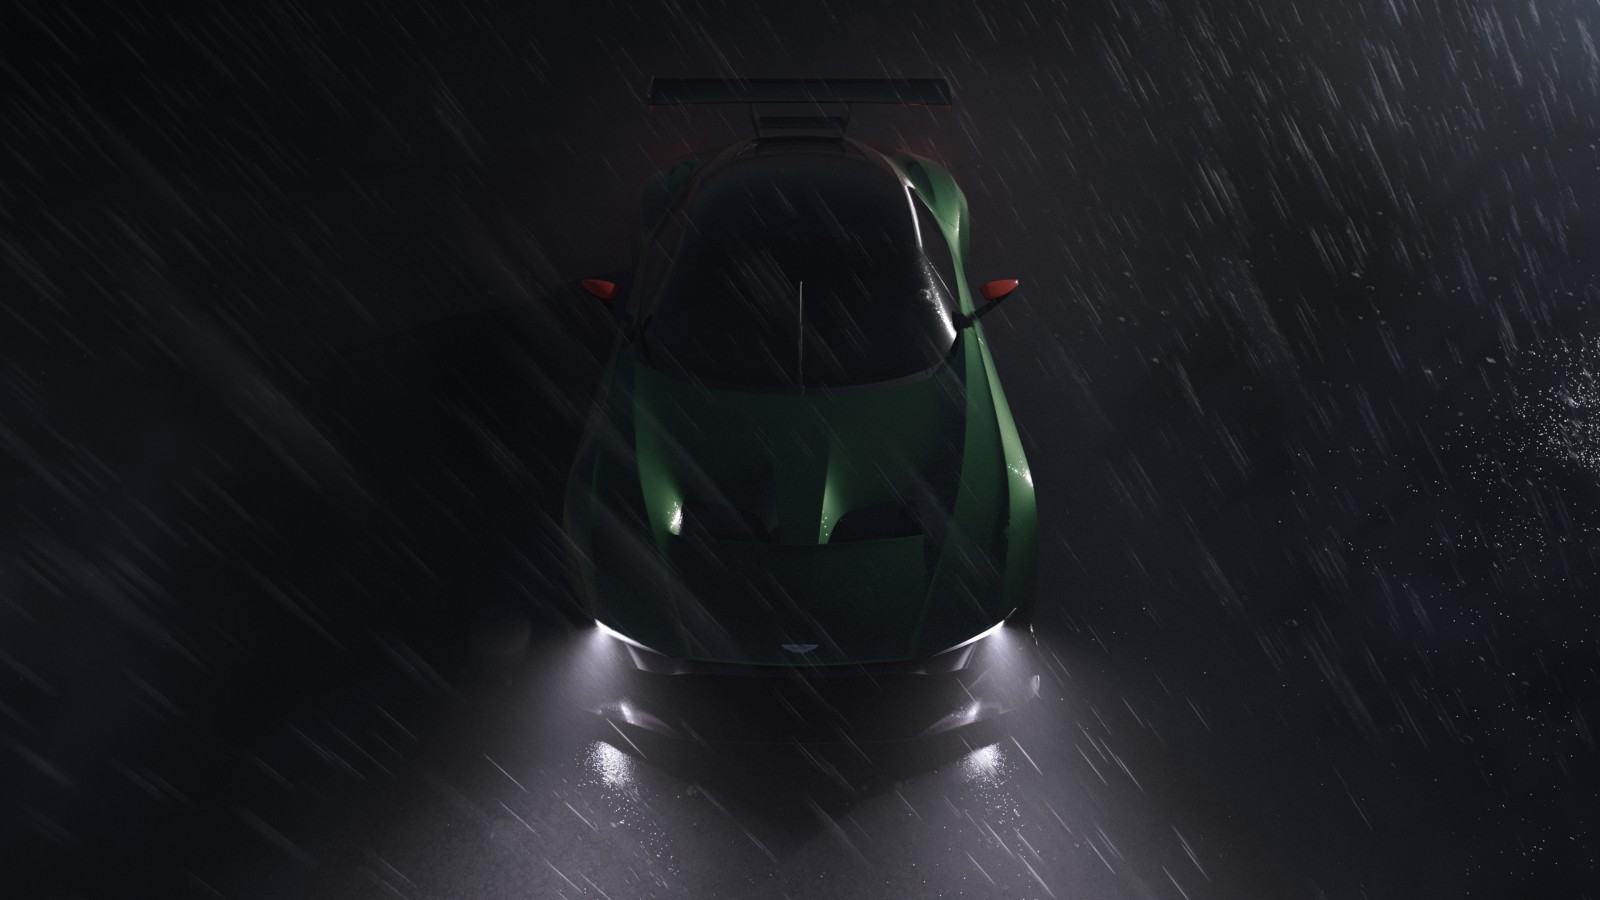 Aston Martin Vulcan 4K Wallpaper | HD Car Wallpapers | ID ...